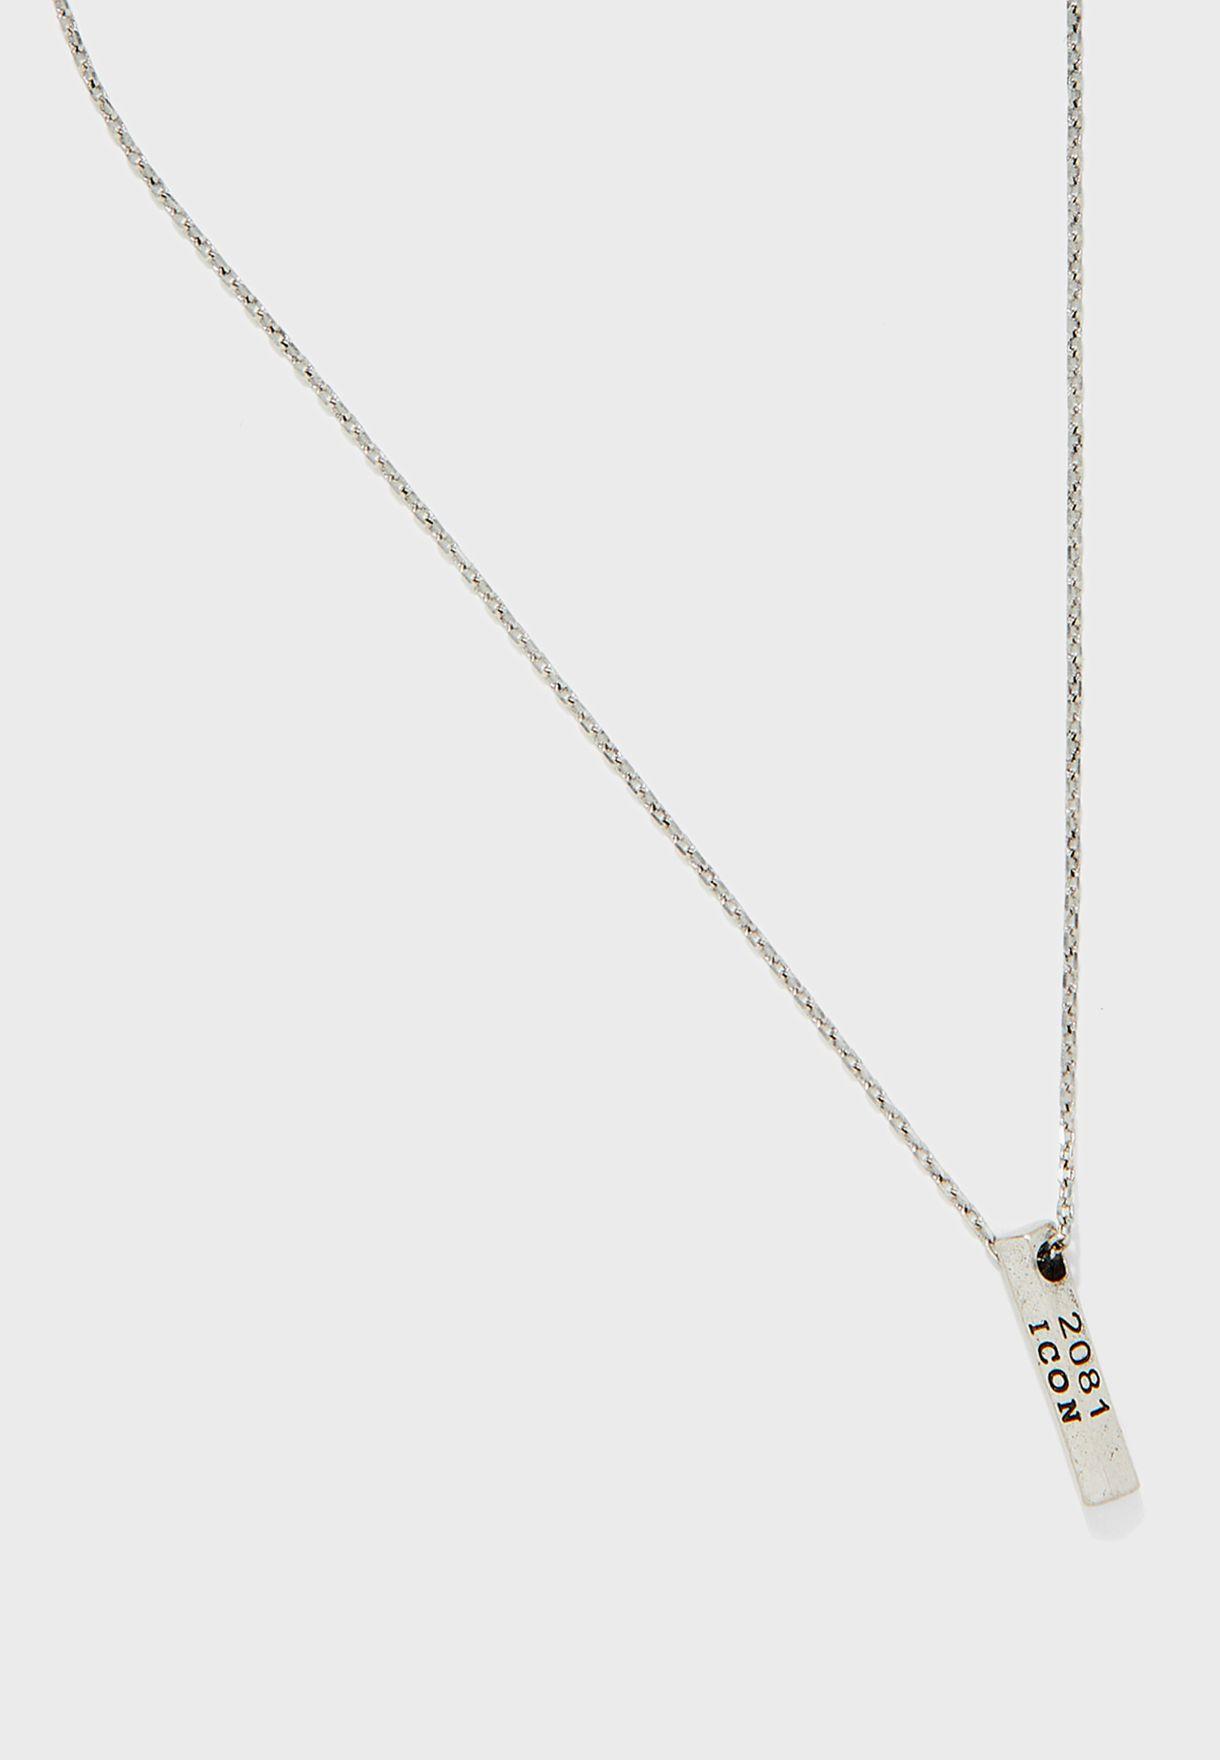 Hardware Design Pendant Necklace